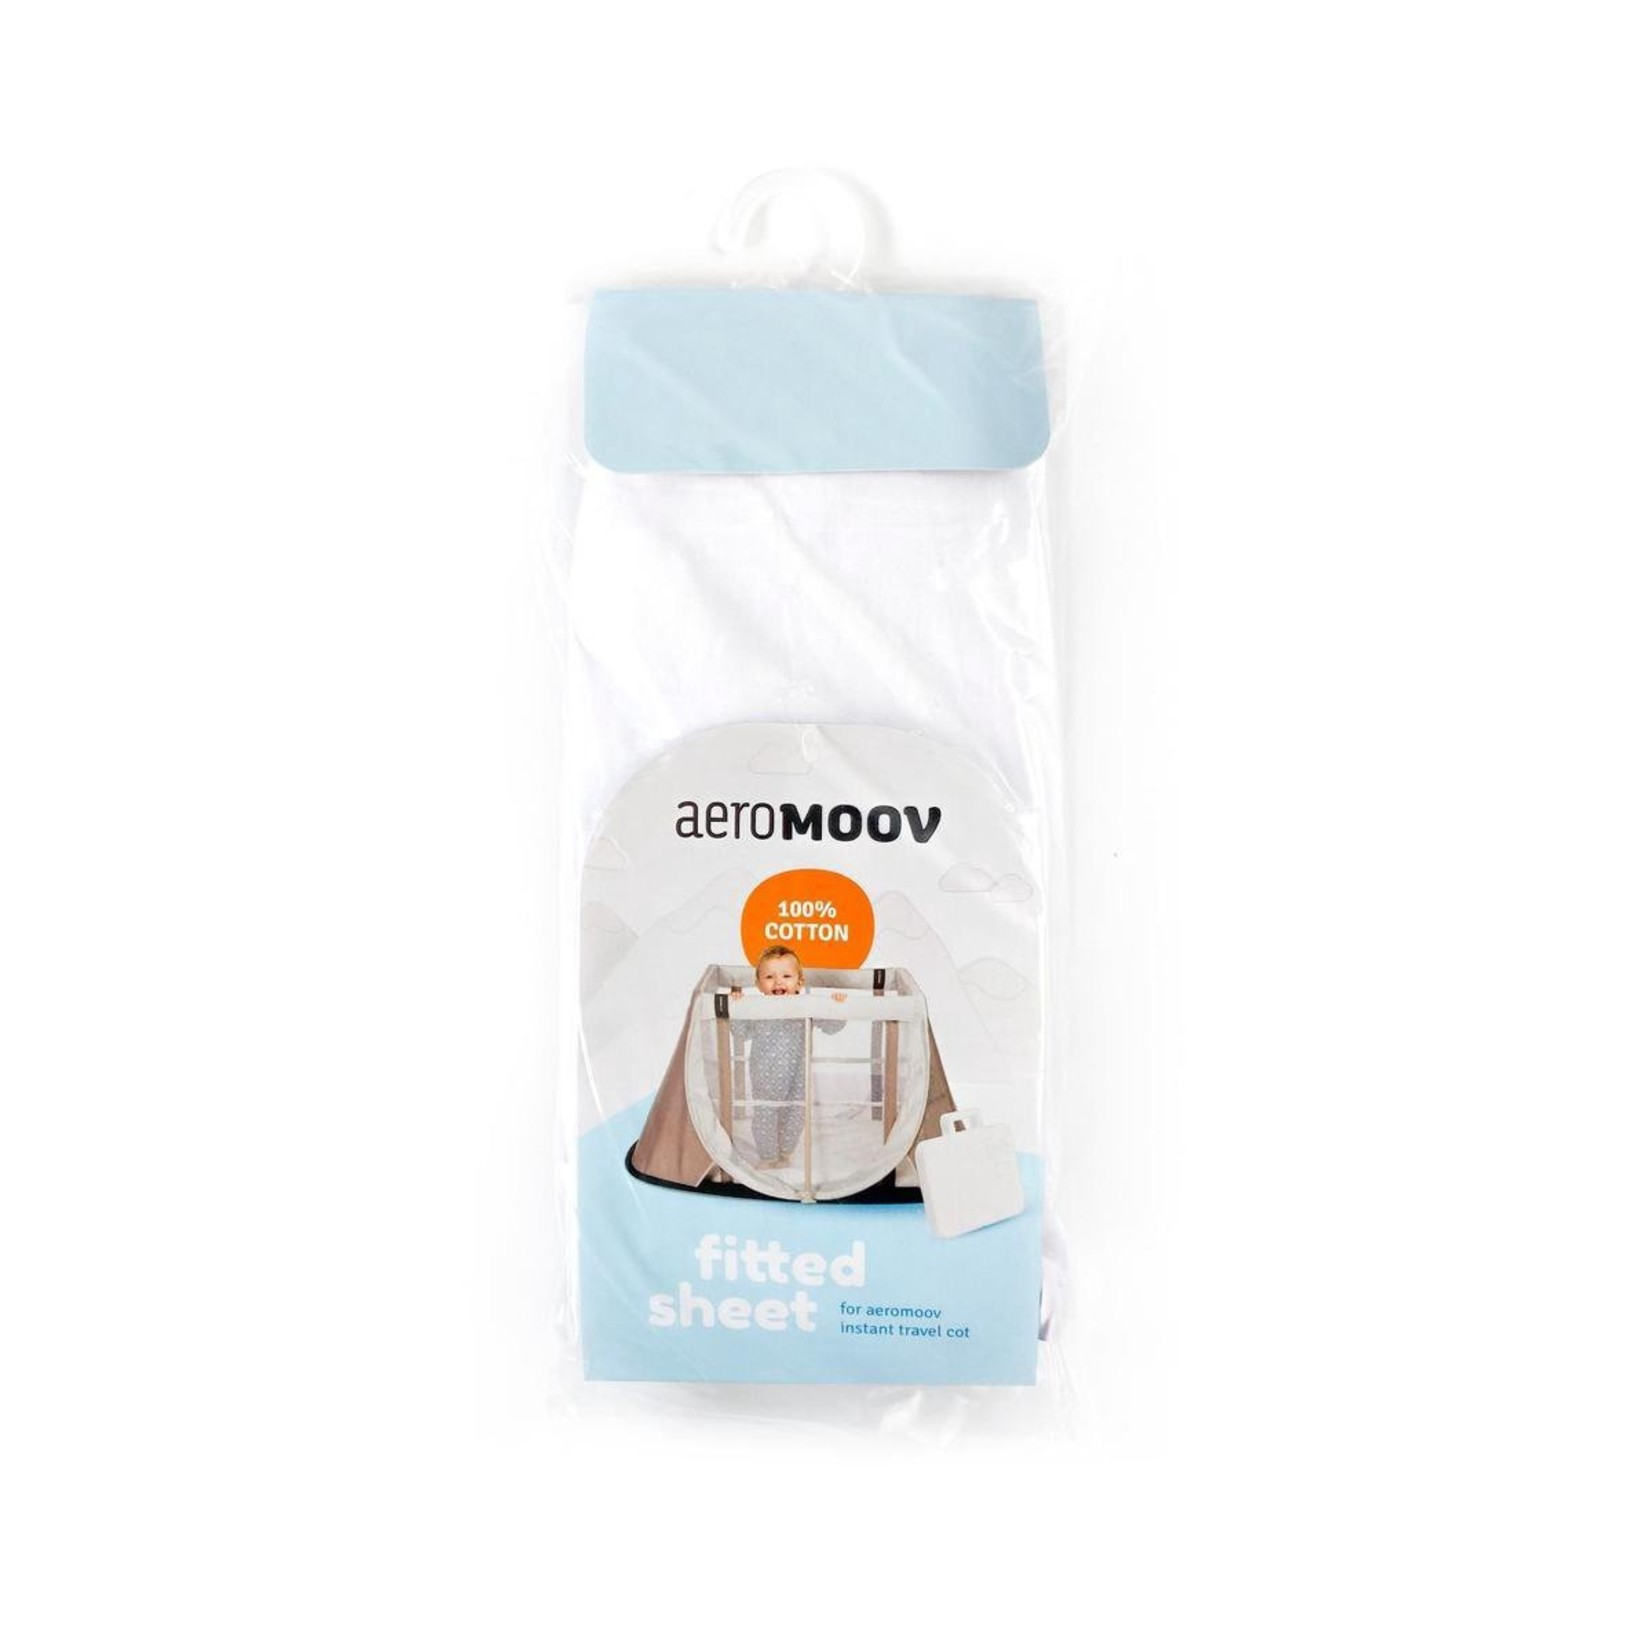 Aeromoov Aeromoov Hoeslaken Cotton White